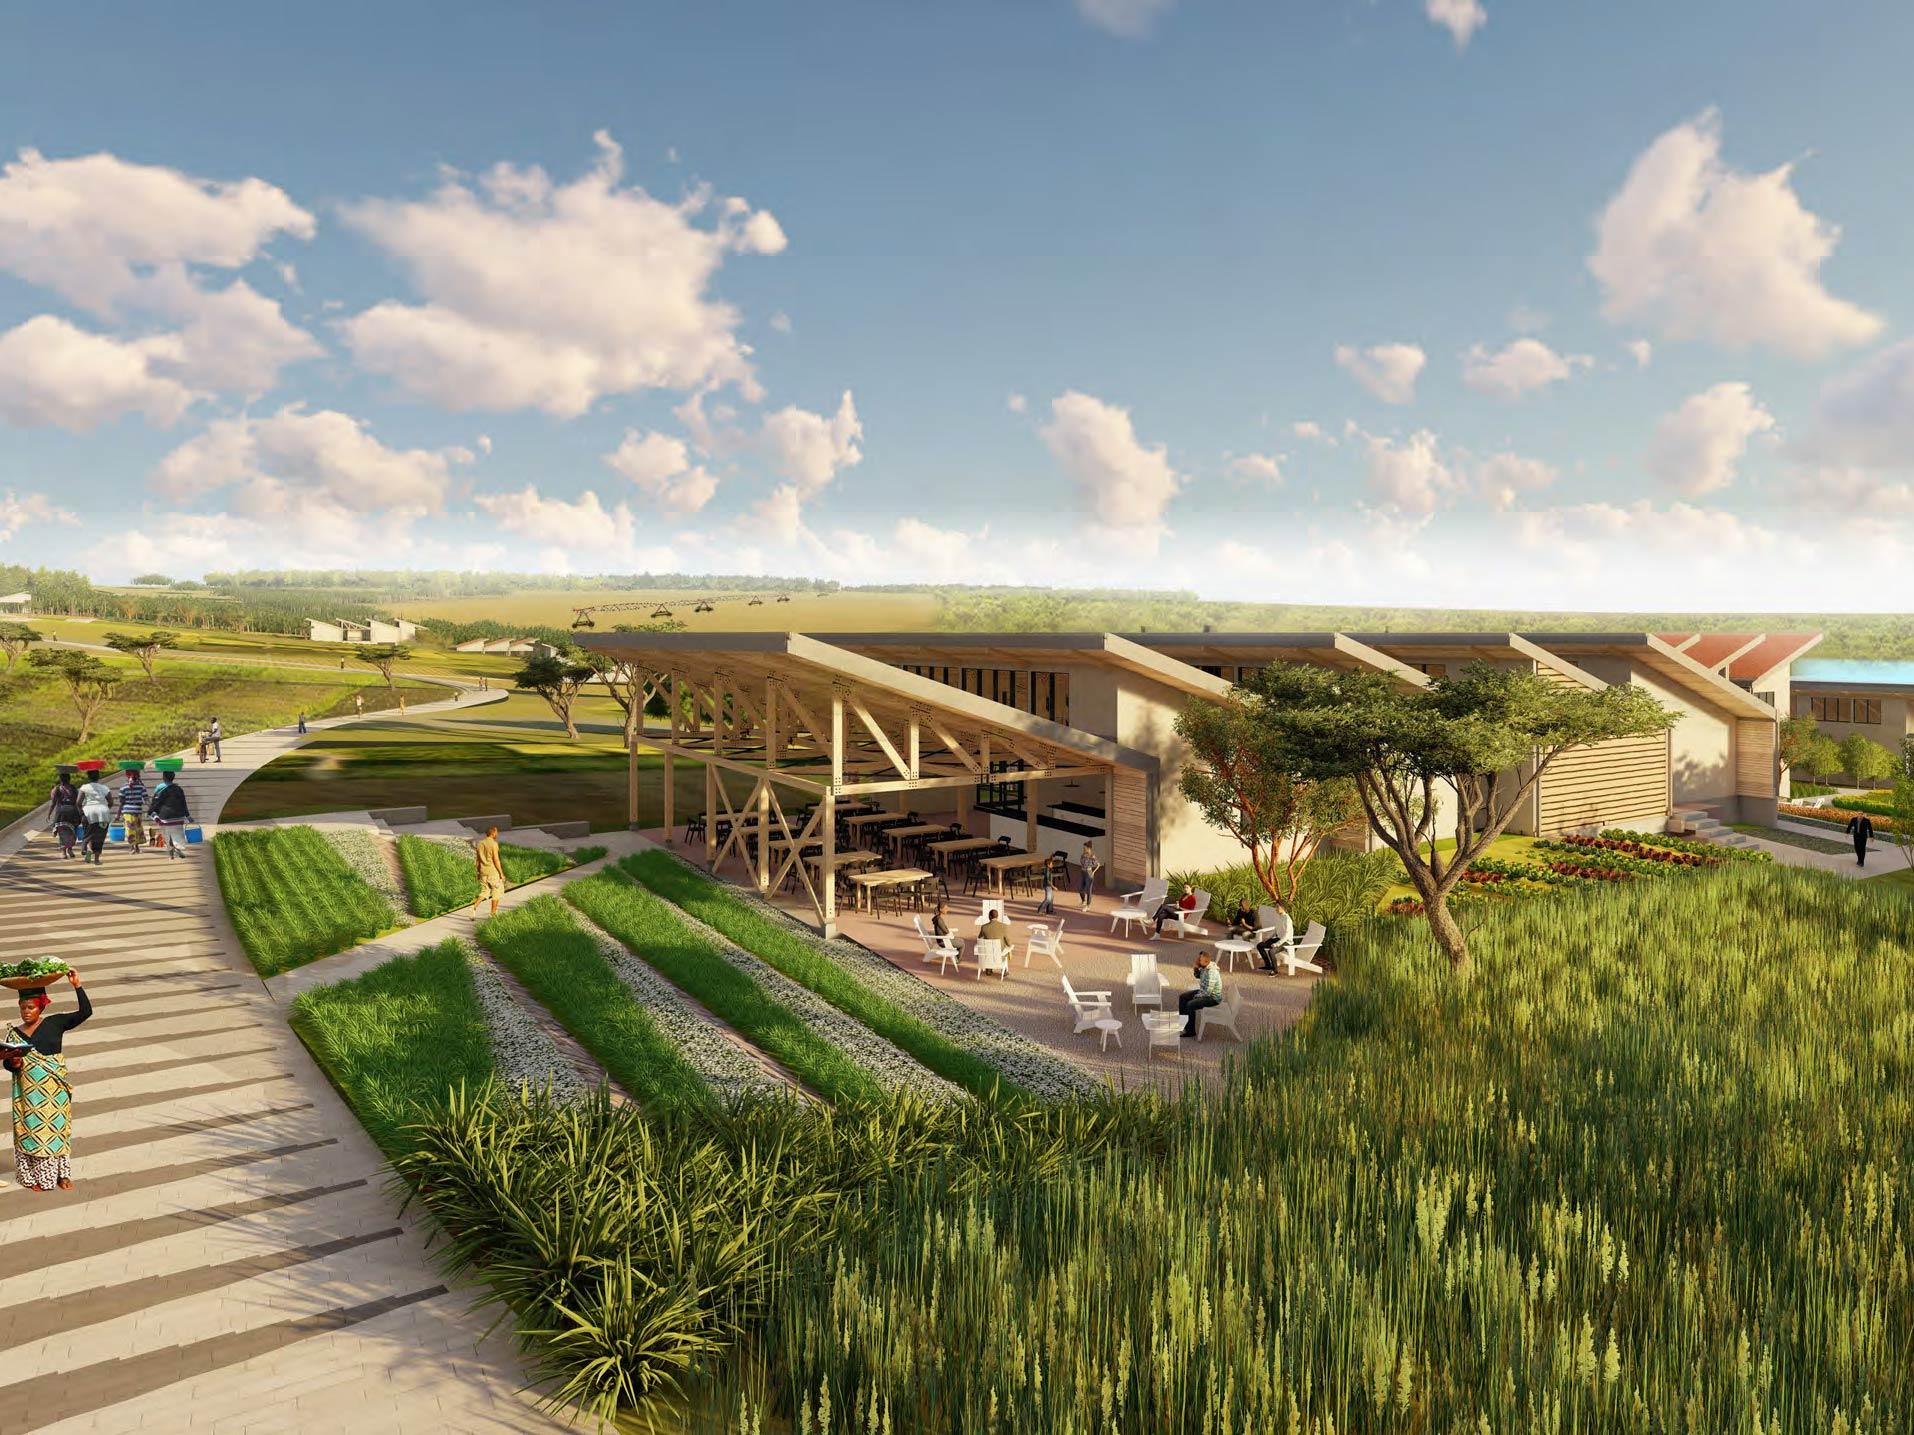 Rwanda Institute for Conservation Agriculture RICA